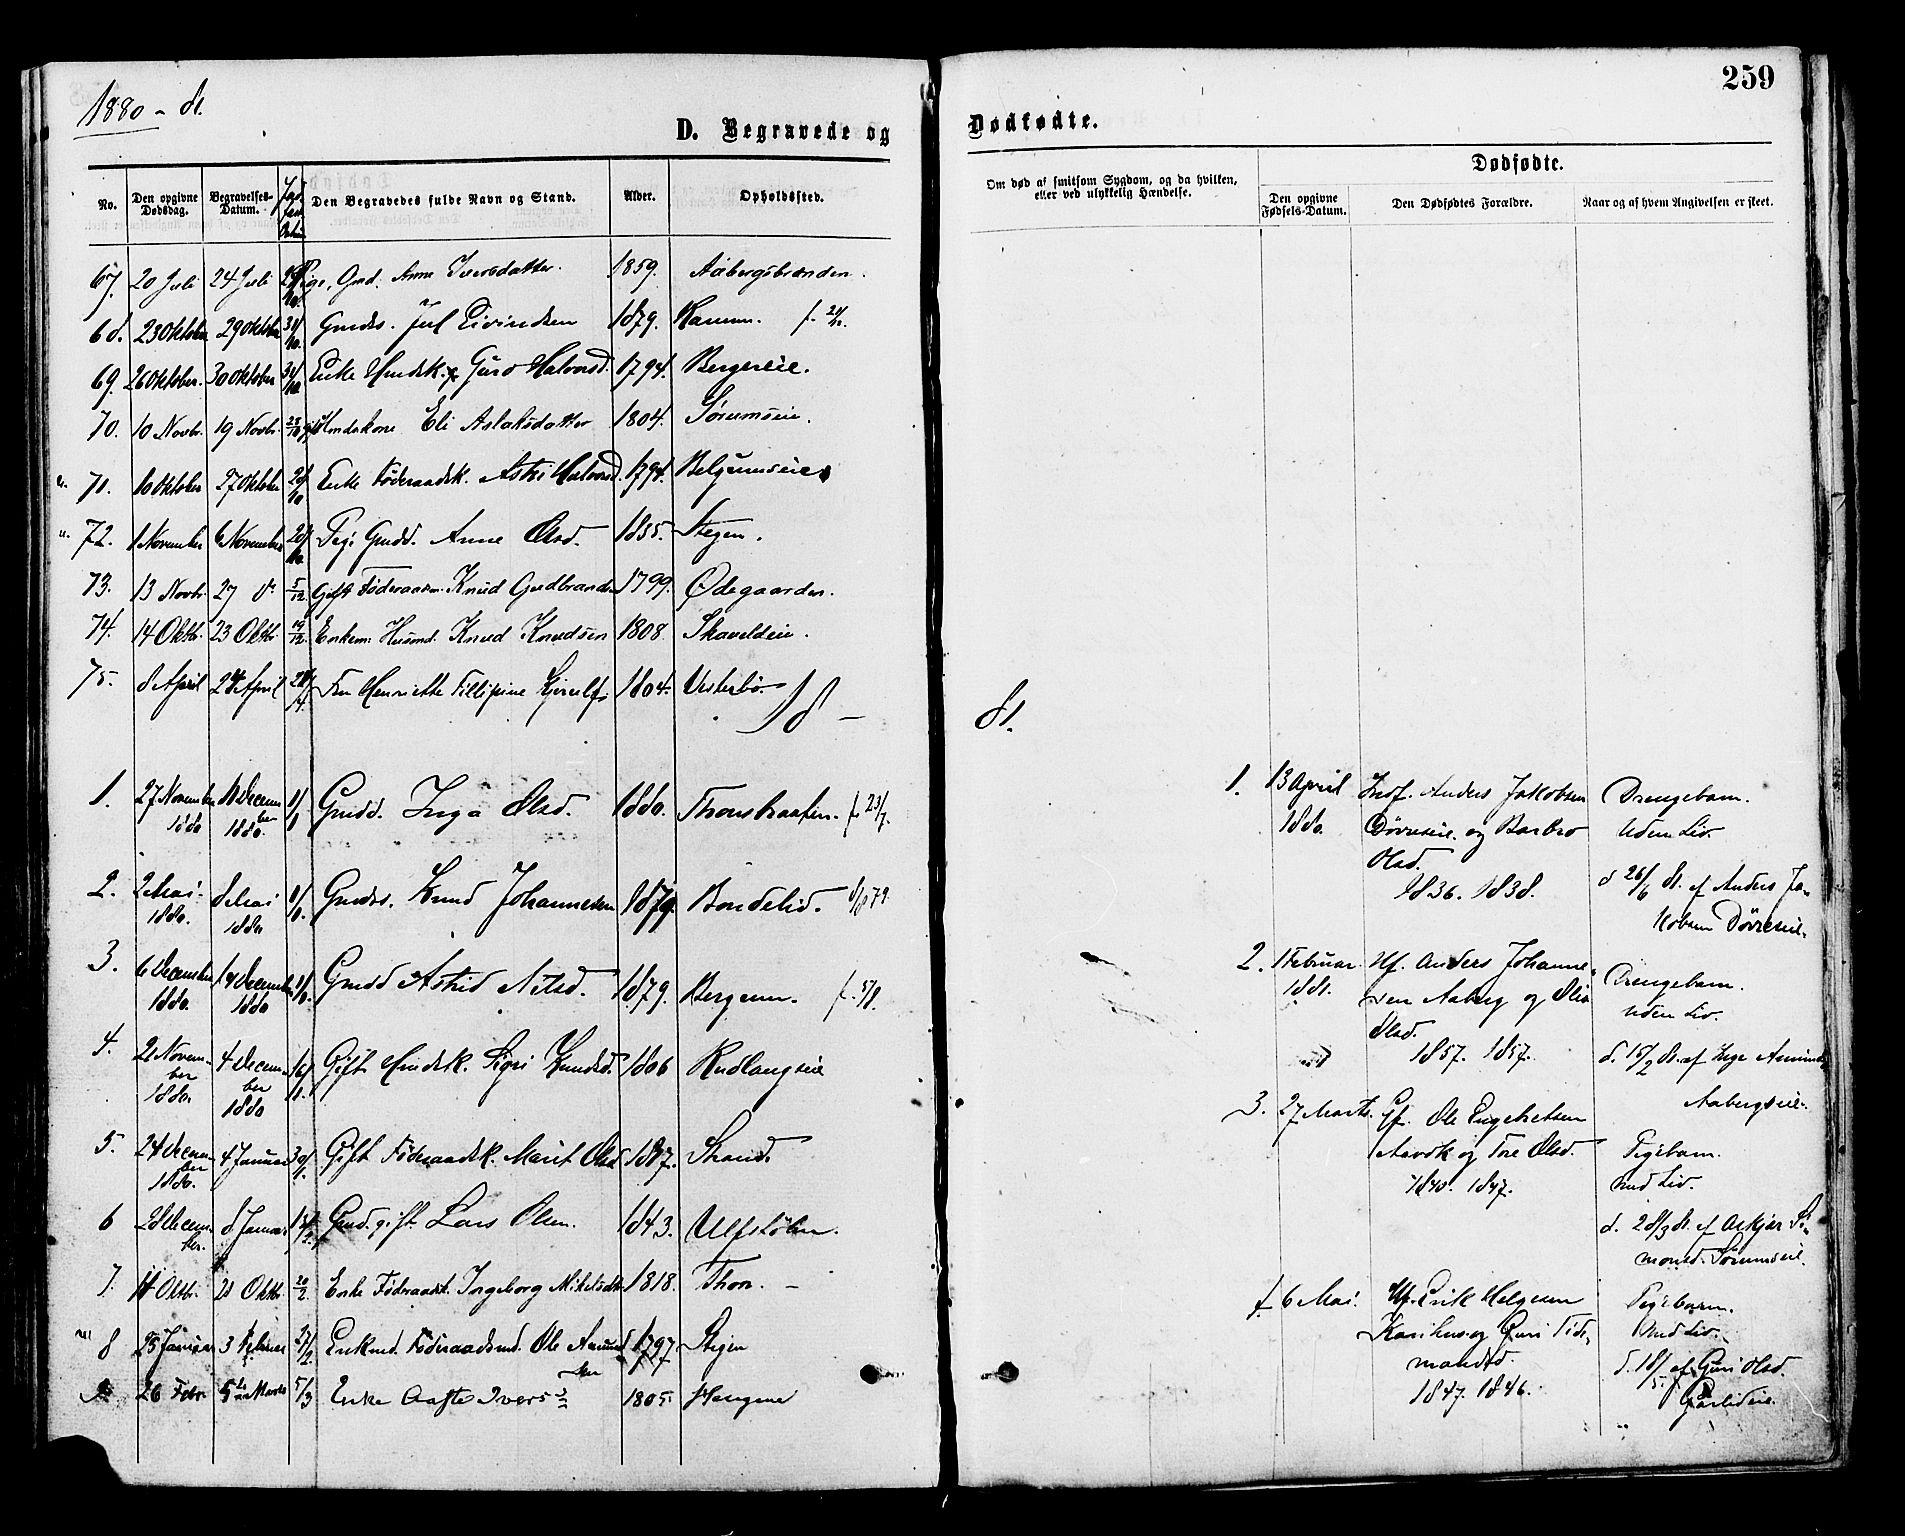 SAH, Nord-Aurdal prestekontor, Ministerialbok nr. 9, 1876-1882, s. 259